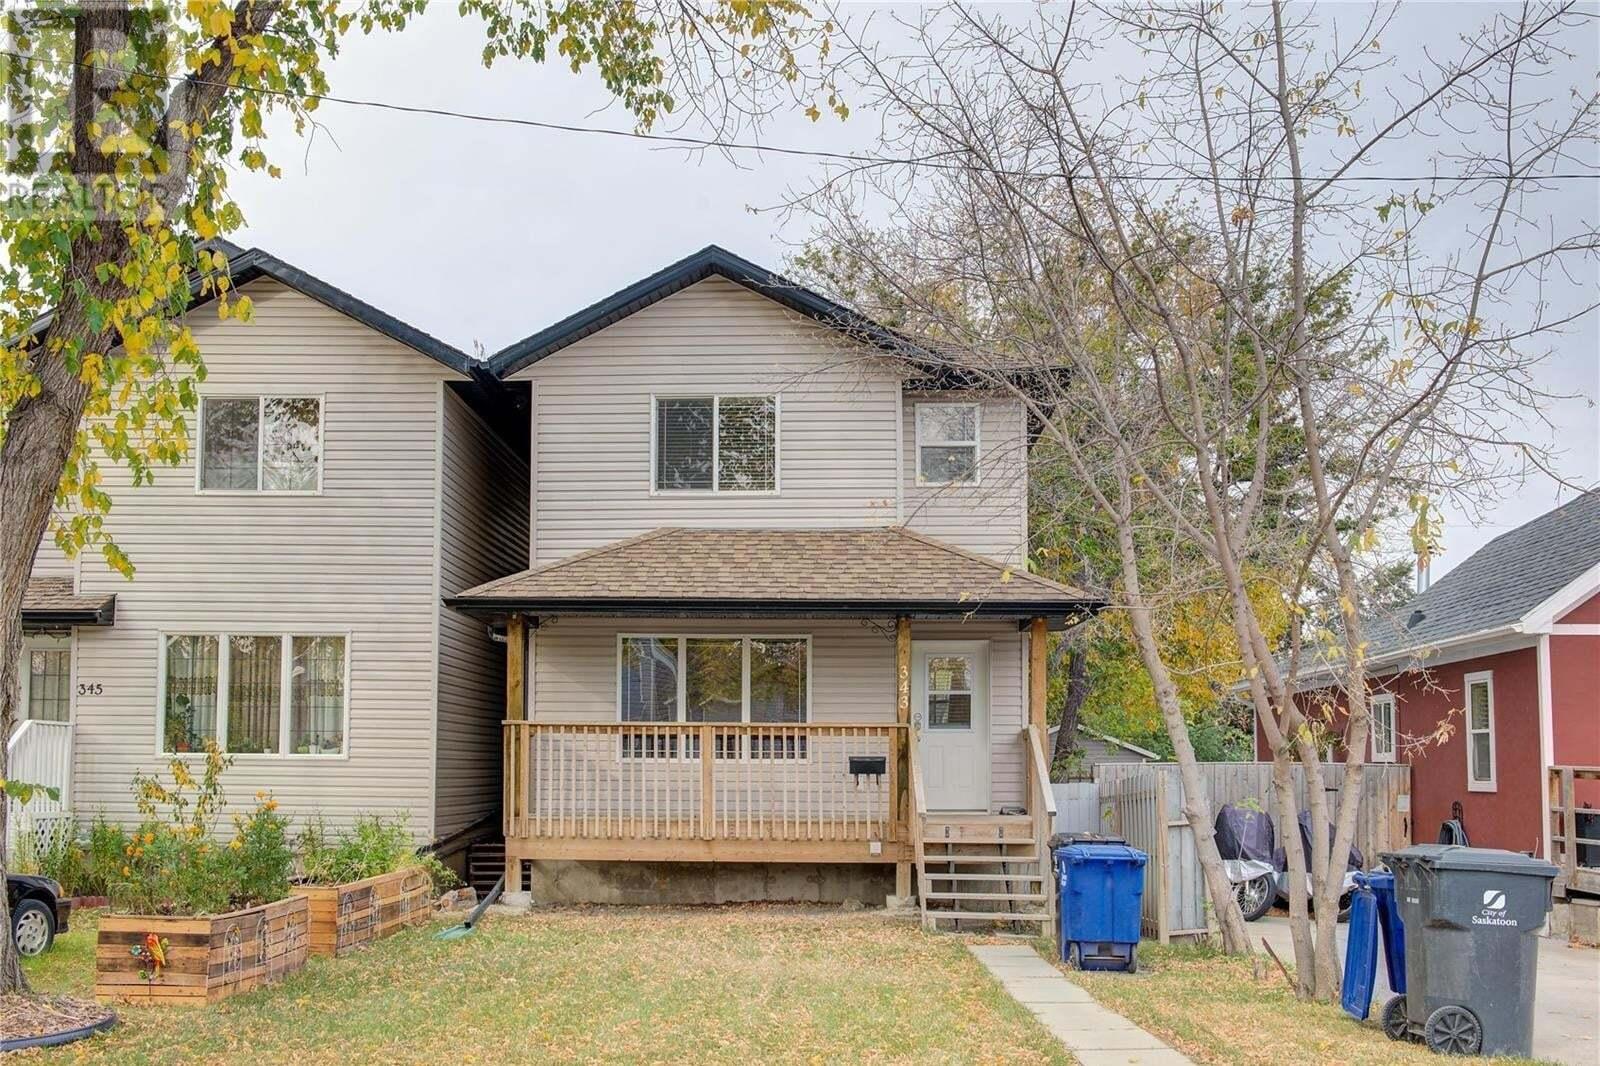 House for sale at 343 V Ave S Saskatoon Saskatchewan - MLS: SK828765